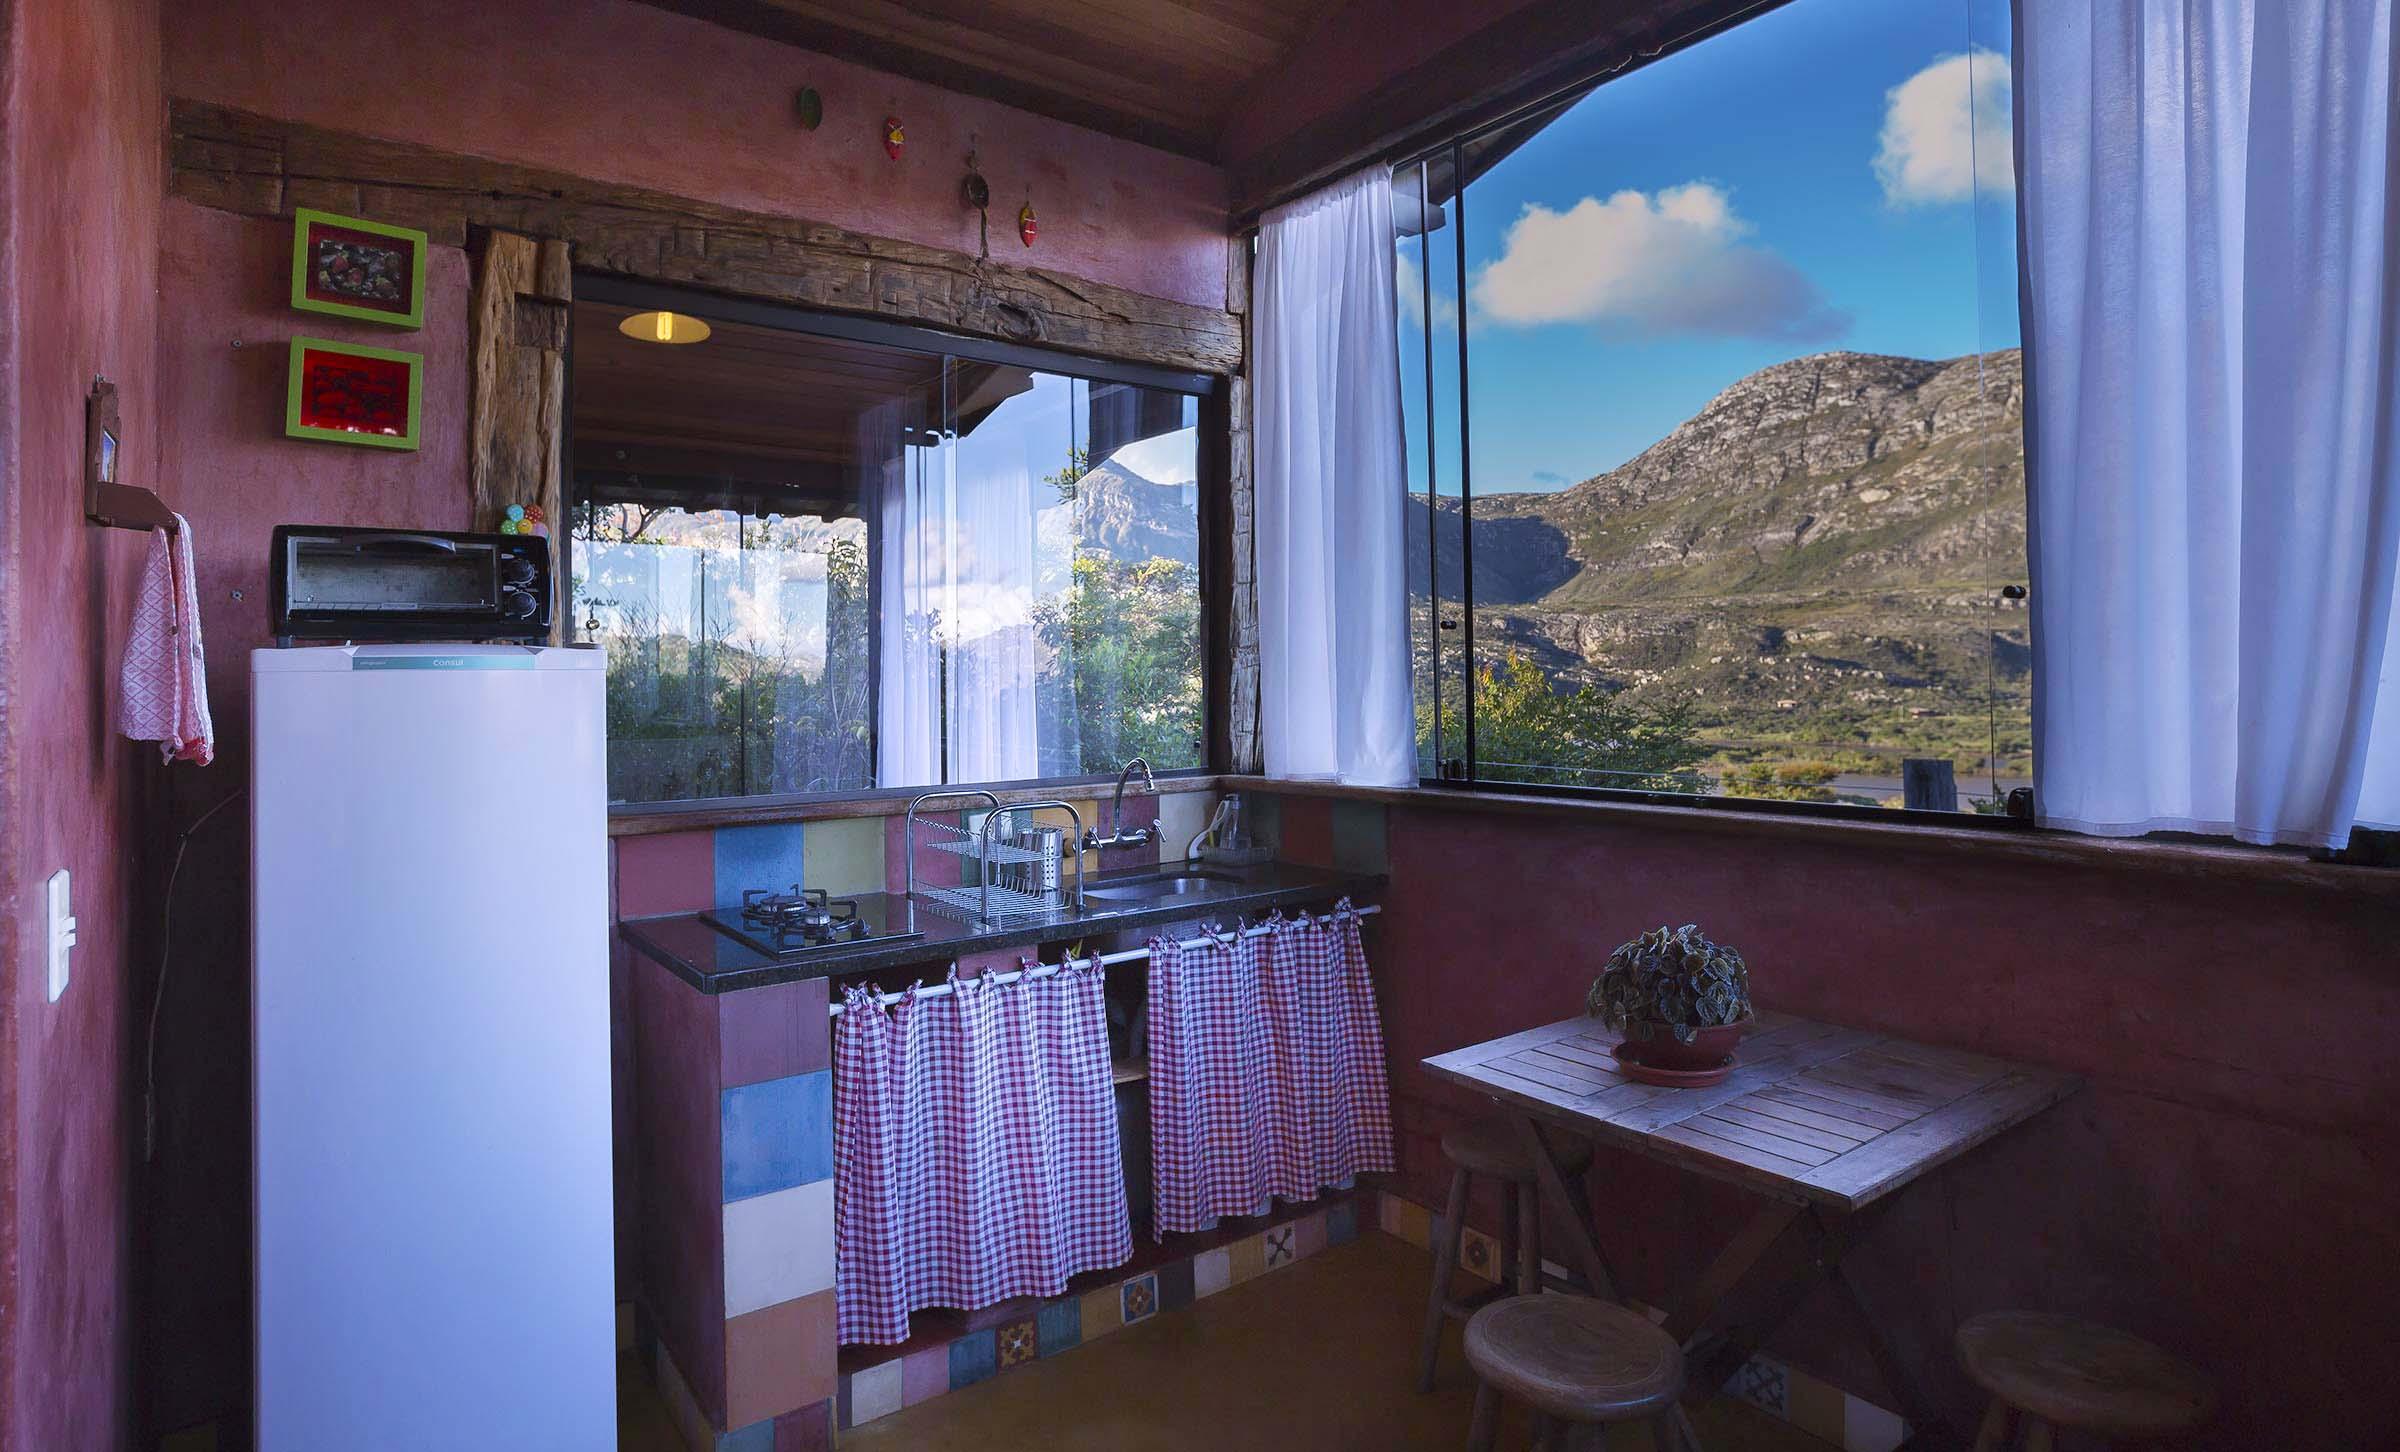 Casa do Teuler - Da Mata Cozinha - Lapinha Da Serra MG - Pousada Hotel Chalés